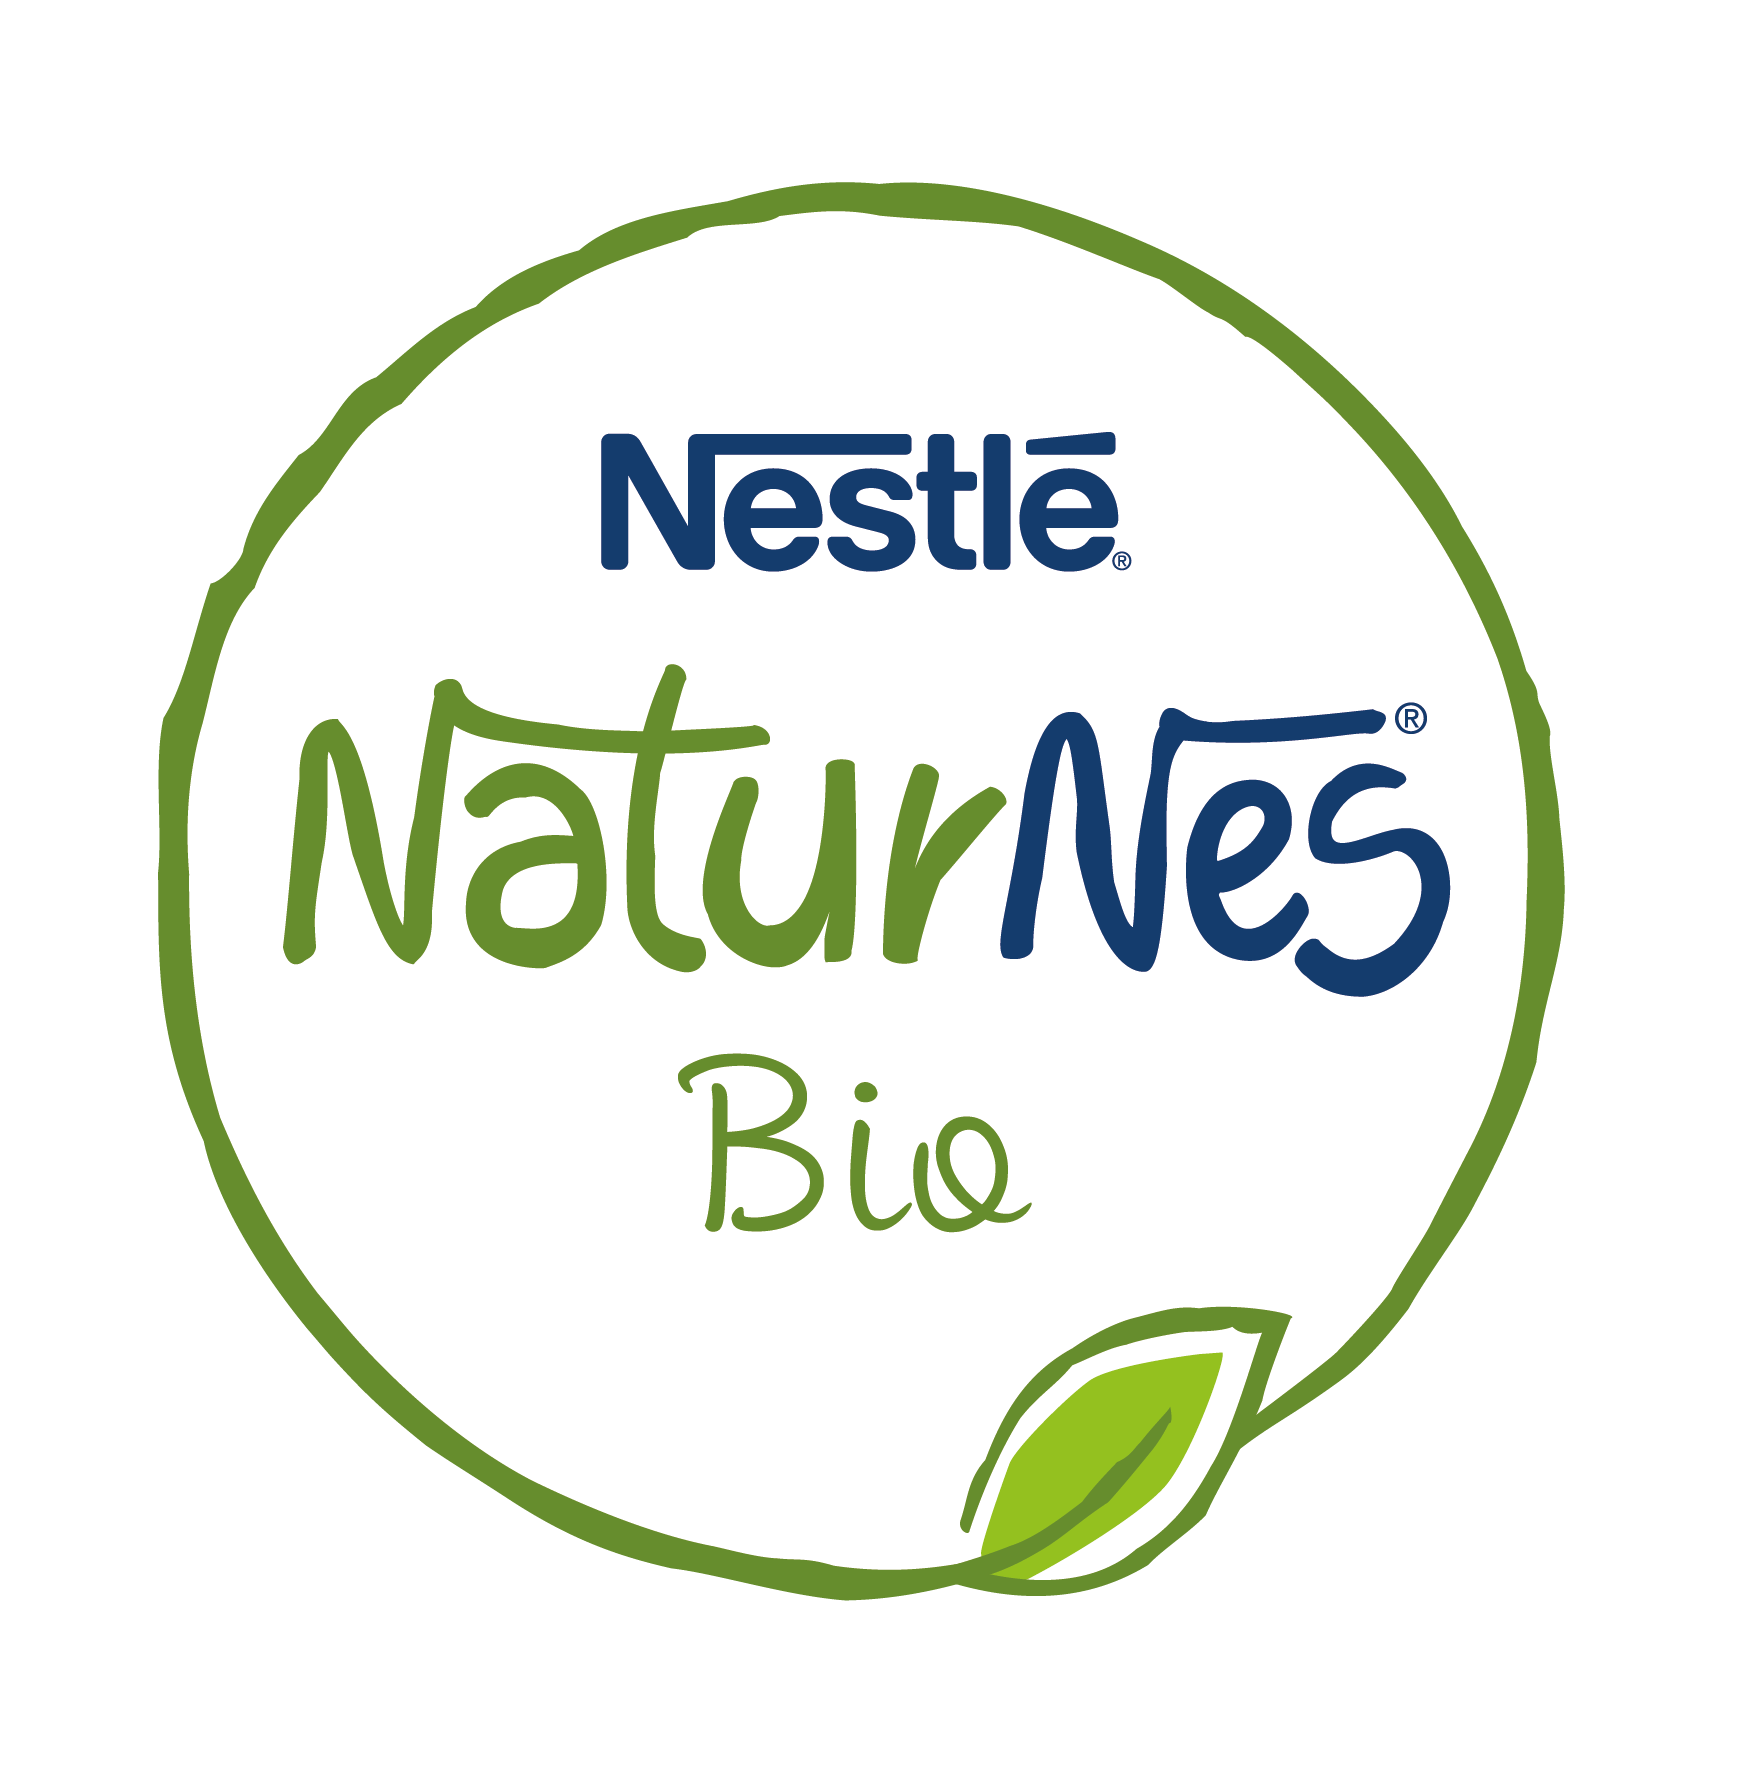 Nestlé Naturnes